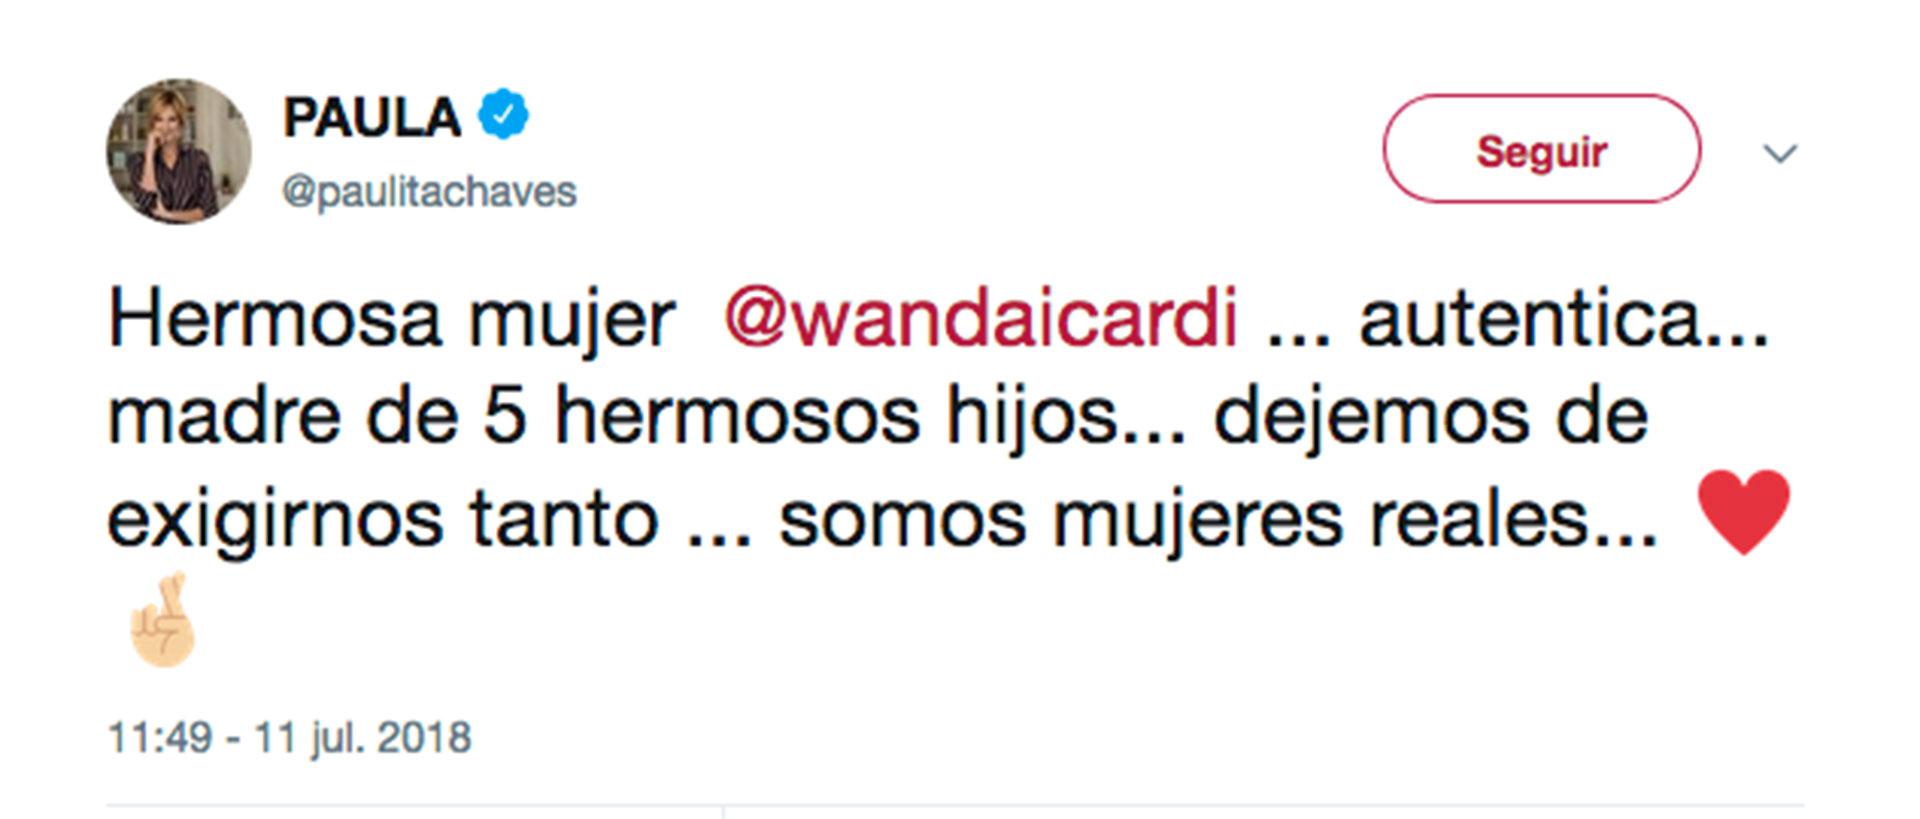 Paula Chaves apoyó a Wanda desde Twitter.